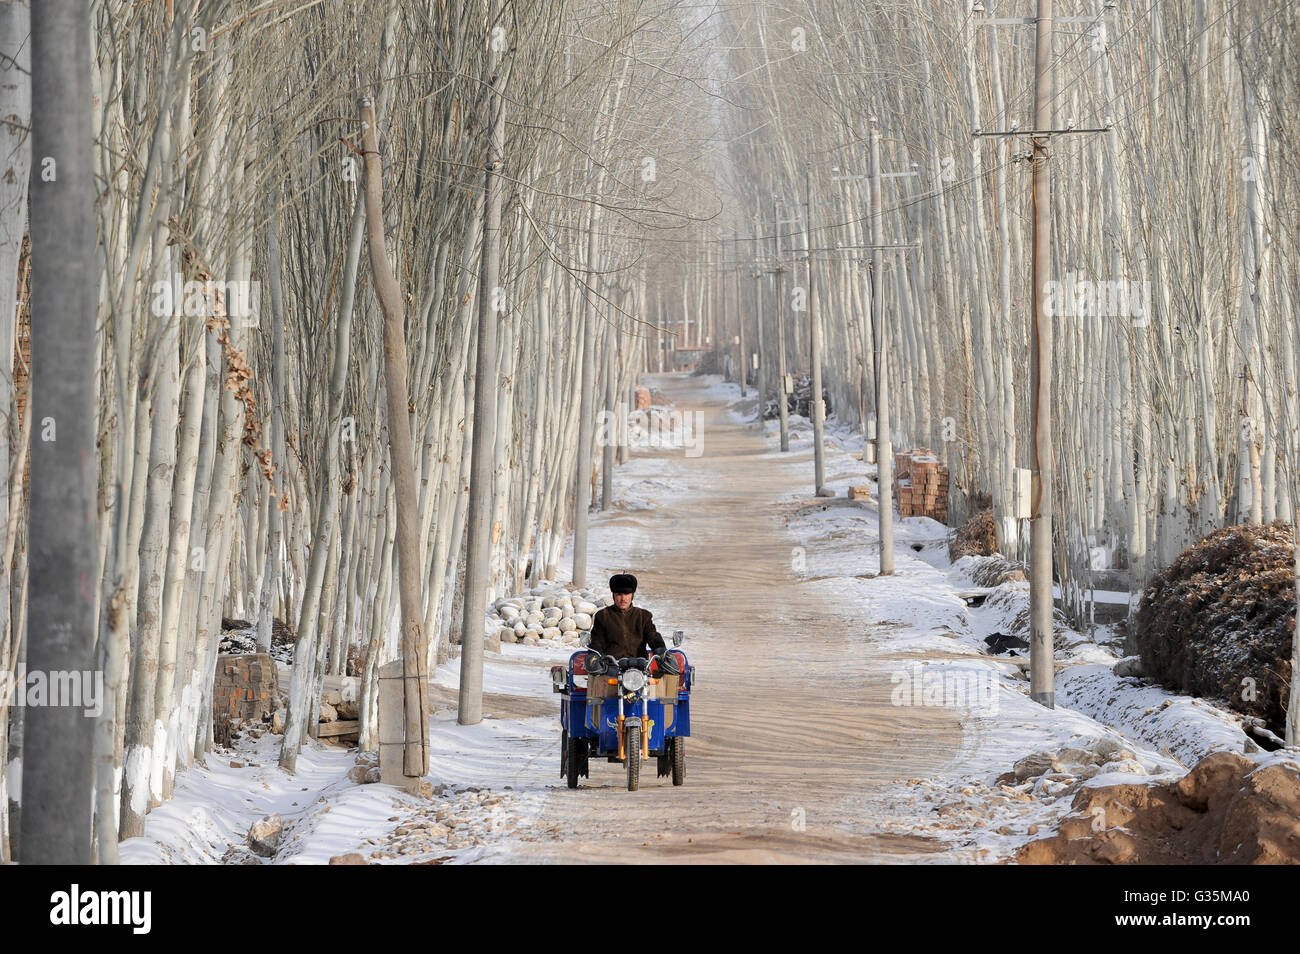 La provincia cinese dello Xinjiang, uighur città Opal vicino a Kashgar / Cina Provinz Xinjiang, uigurische Immagini Stock